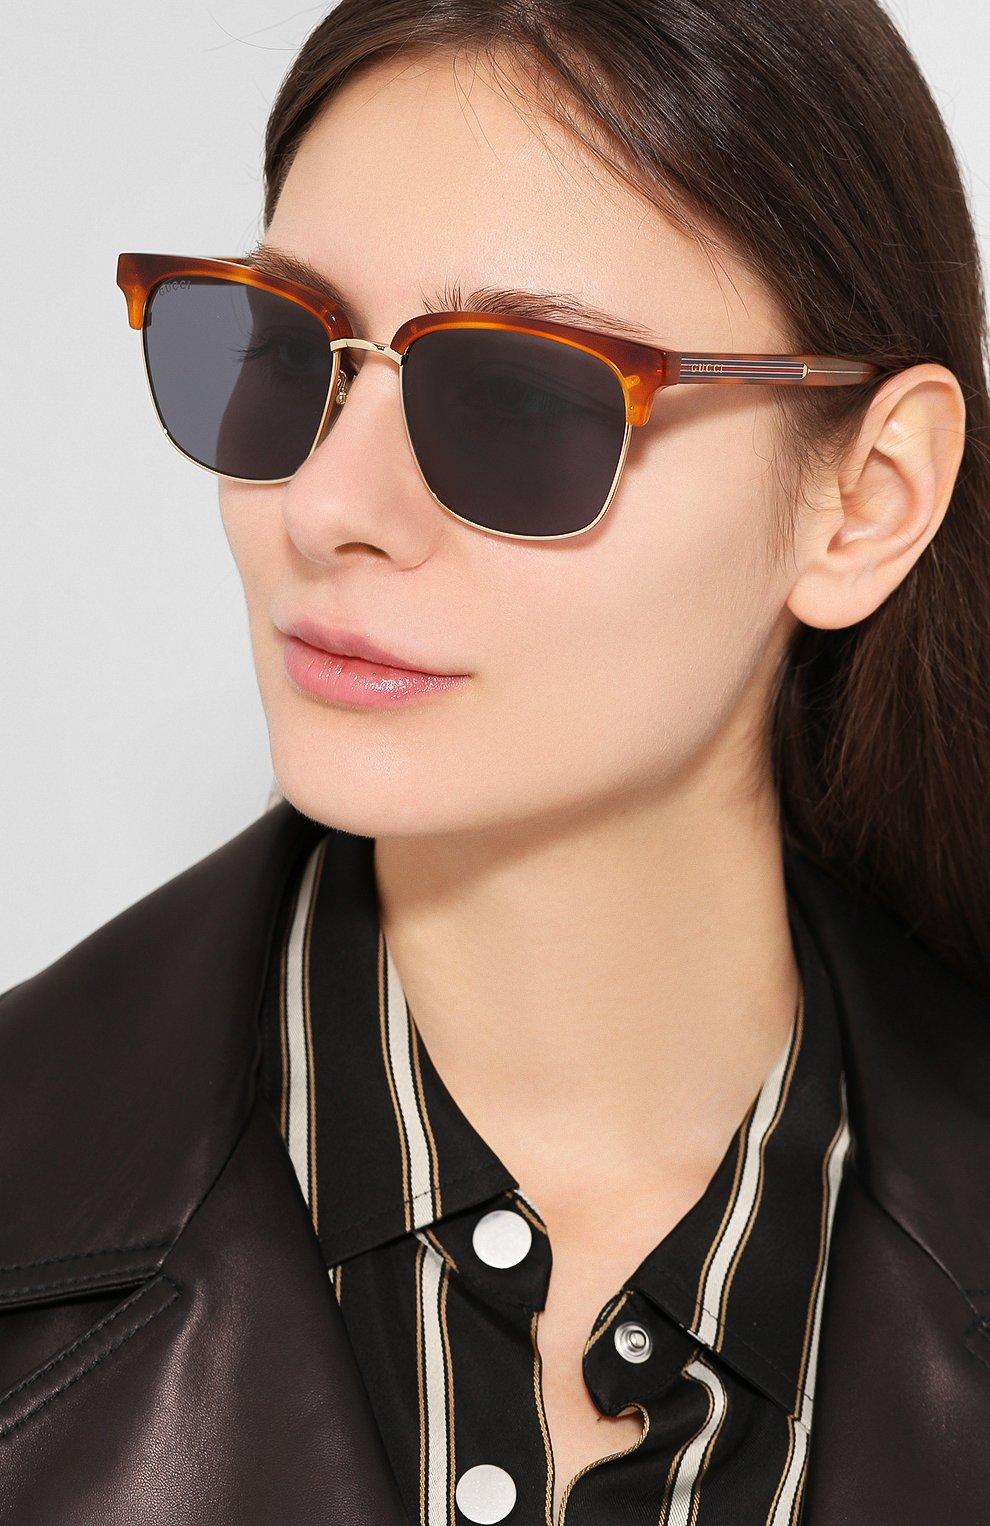 Солнцезащитные очки Gucci синие   Фото №2